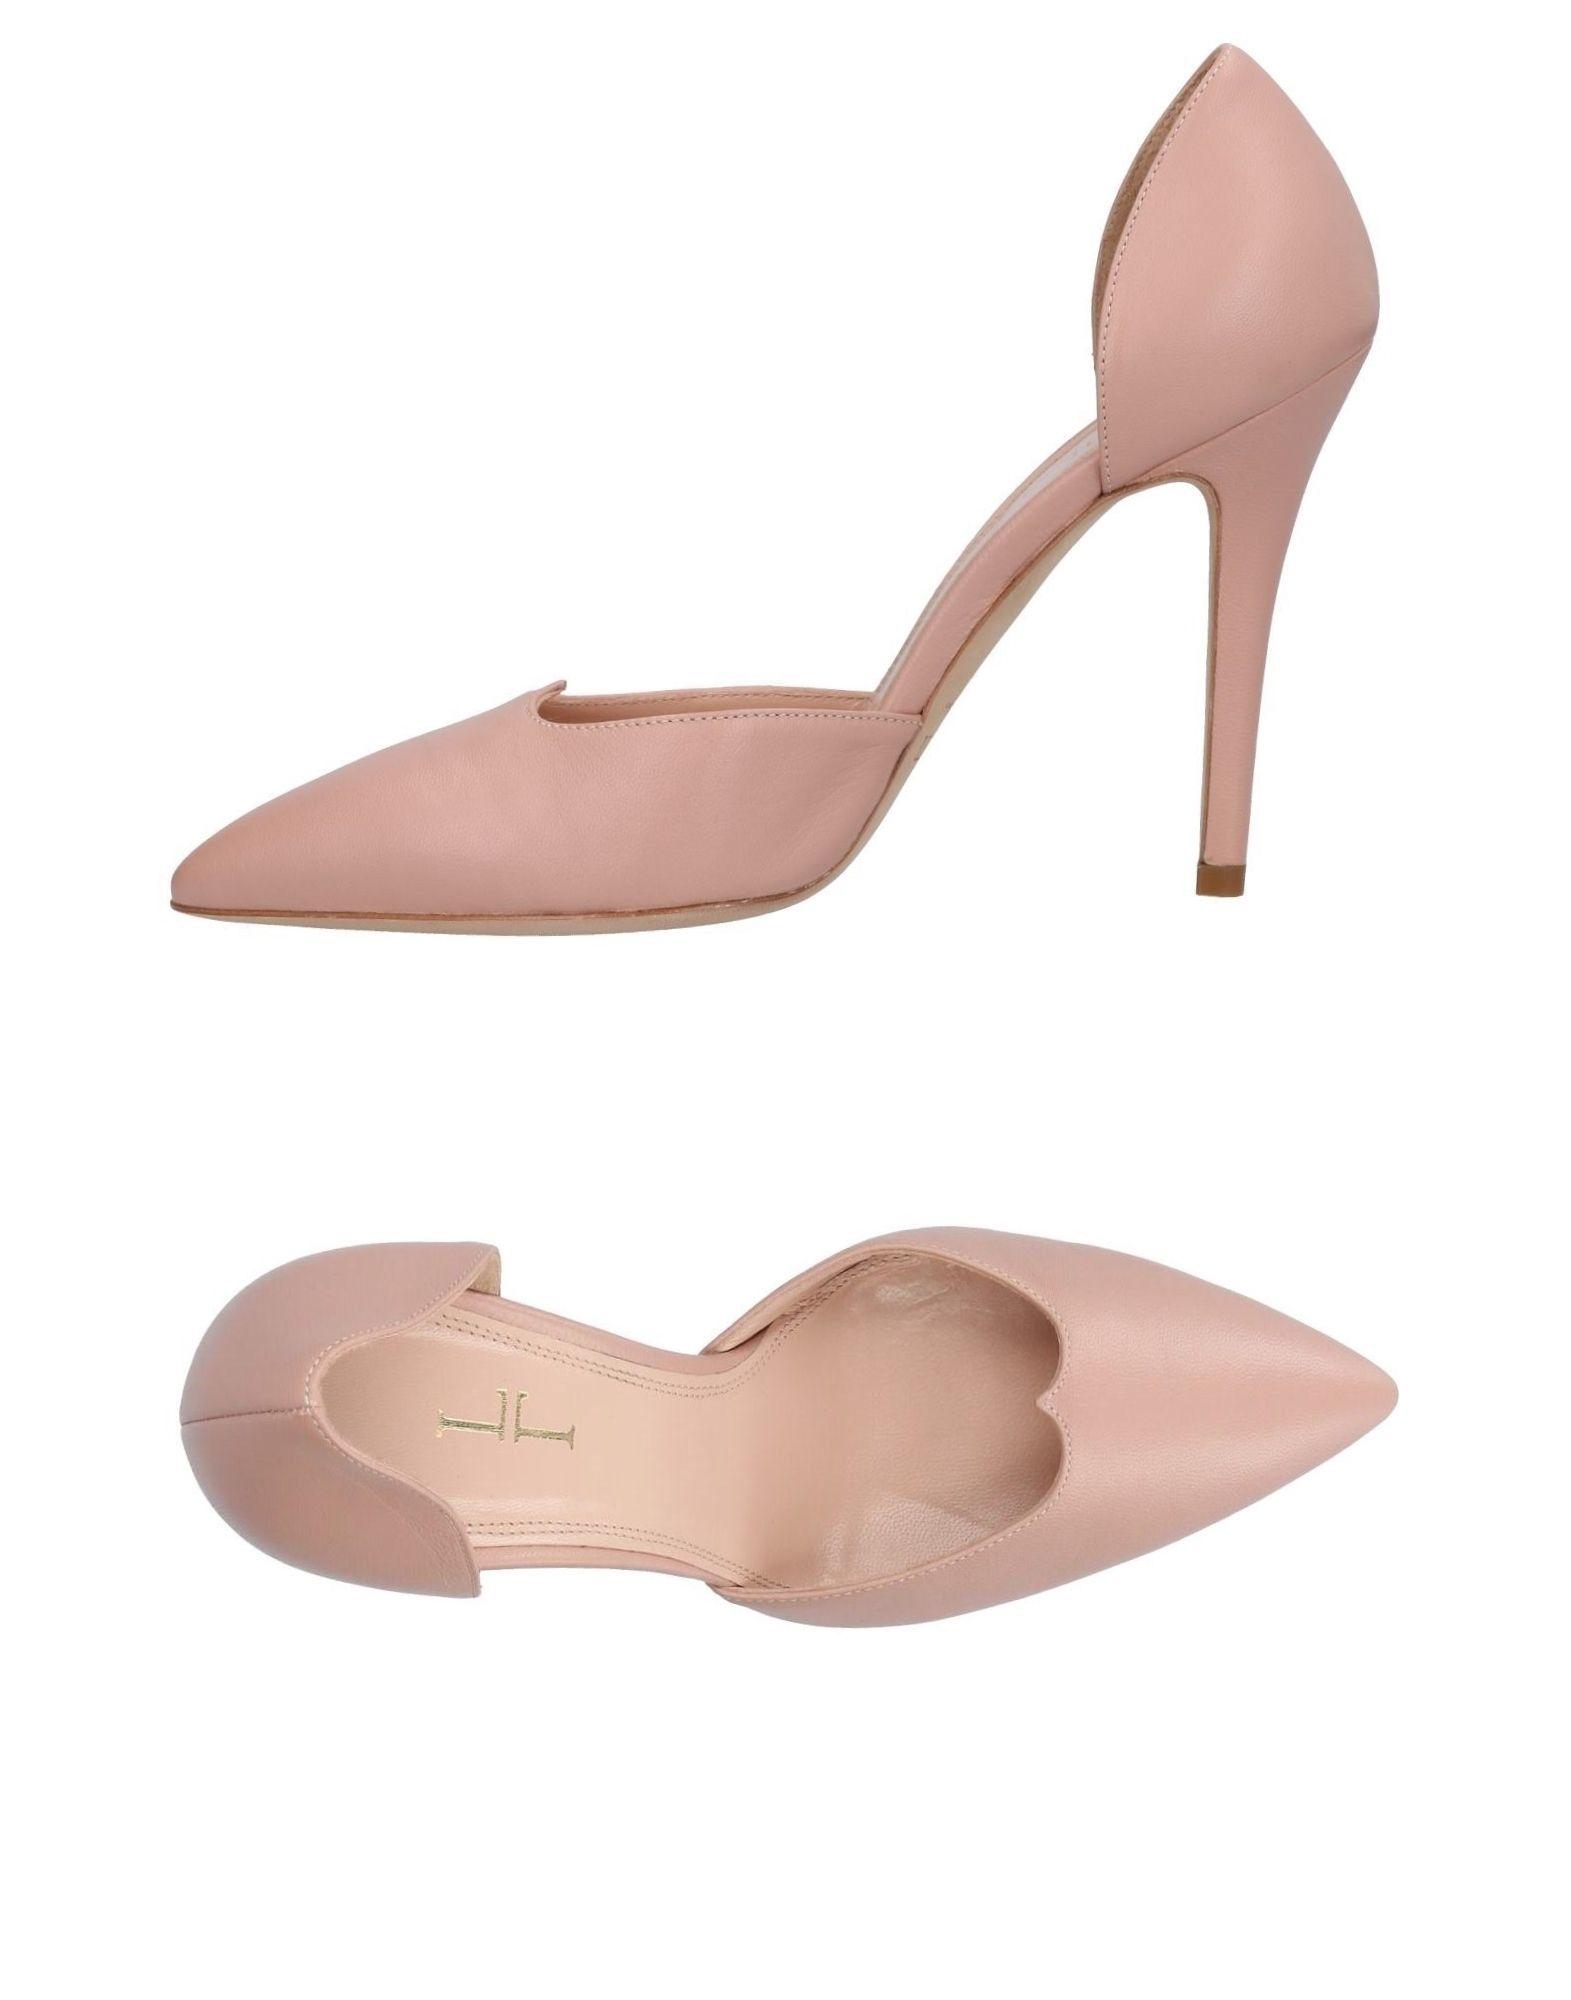 Lamperti Milano Pumps Qualität Damen  11415077WG Gute Qualität Pumps beliebte Schuhe 3b8461